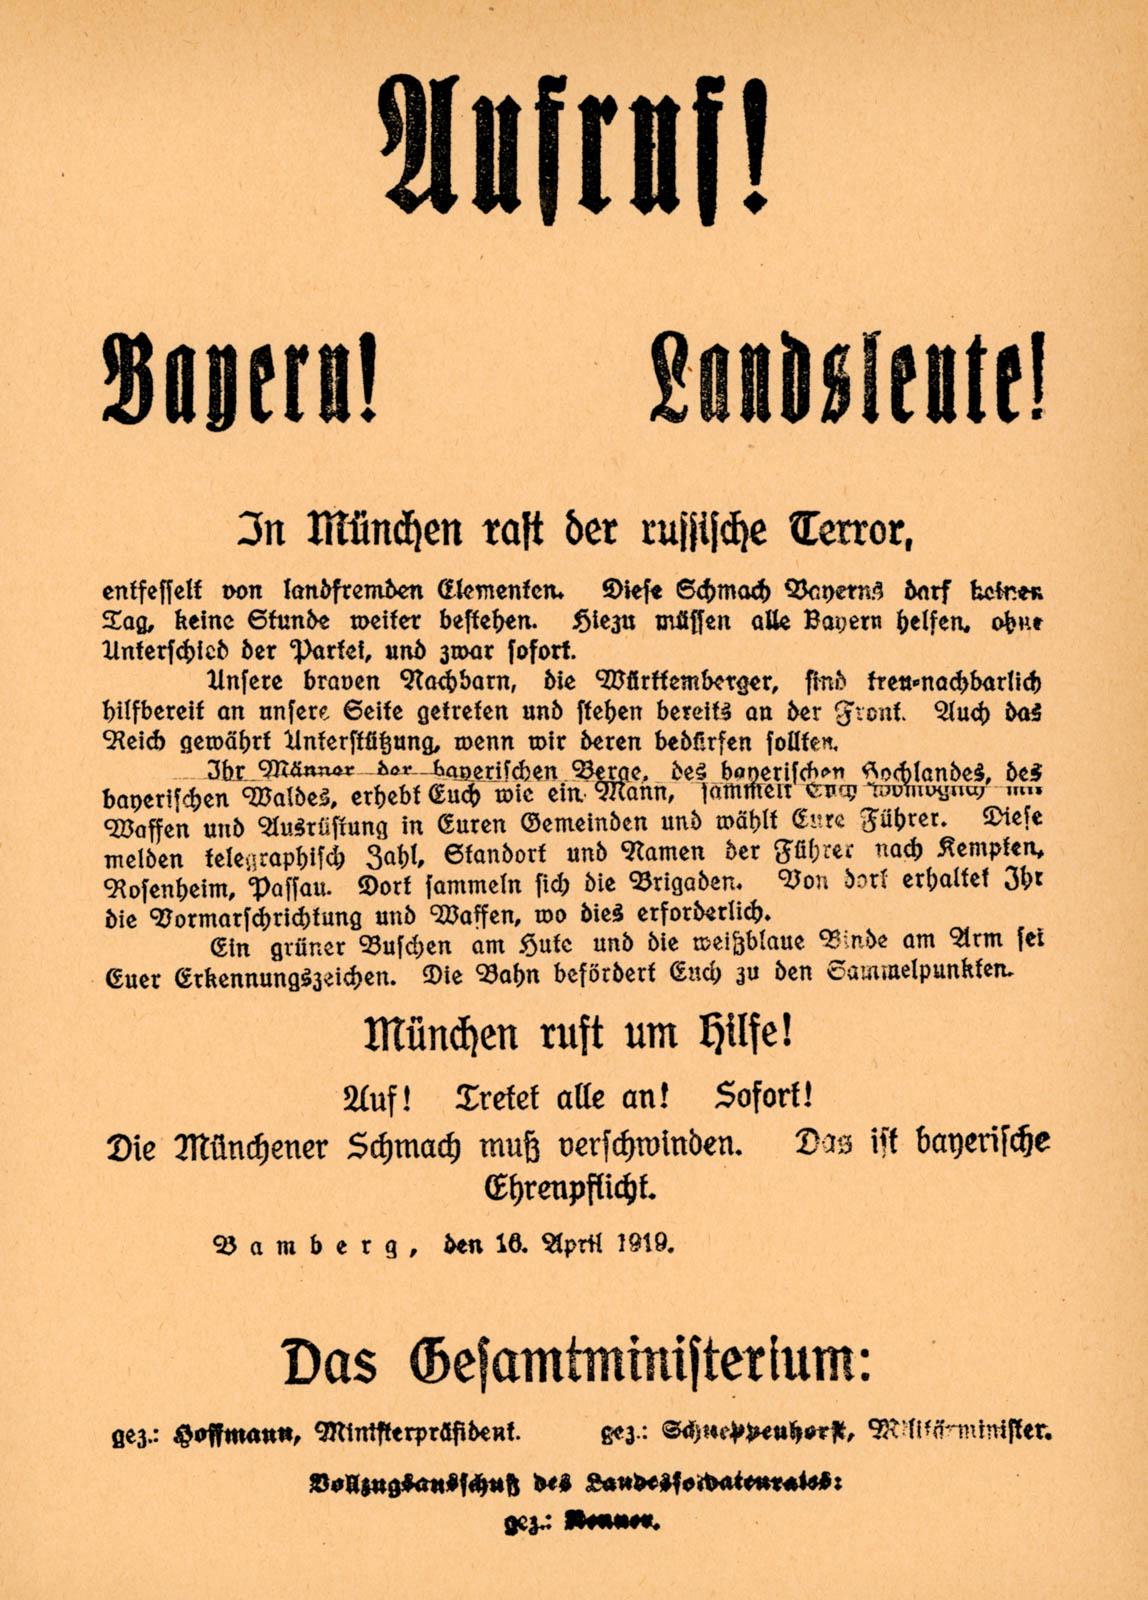 Aufruf! Bayern! Landsleute!